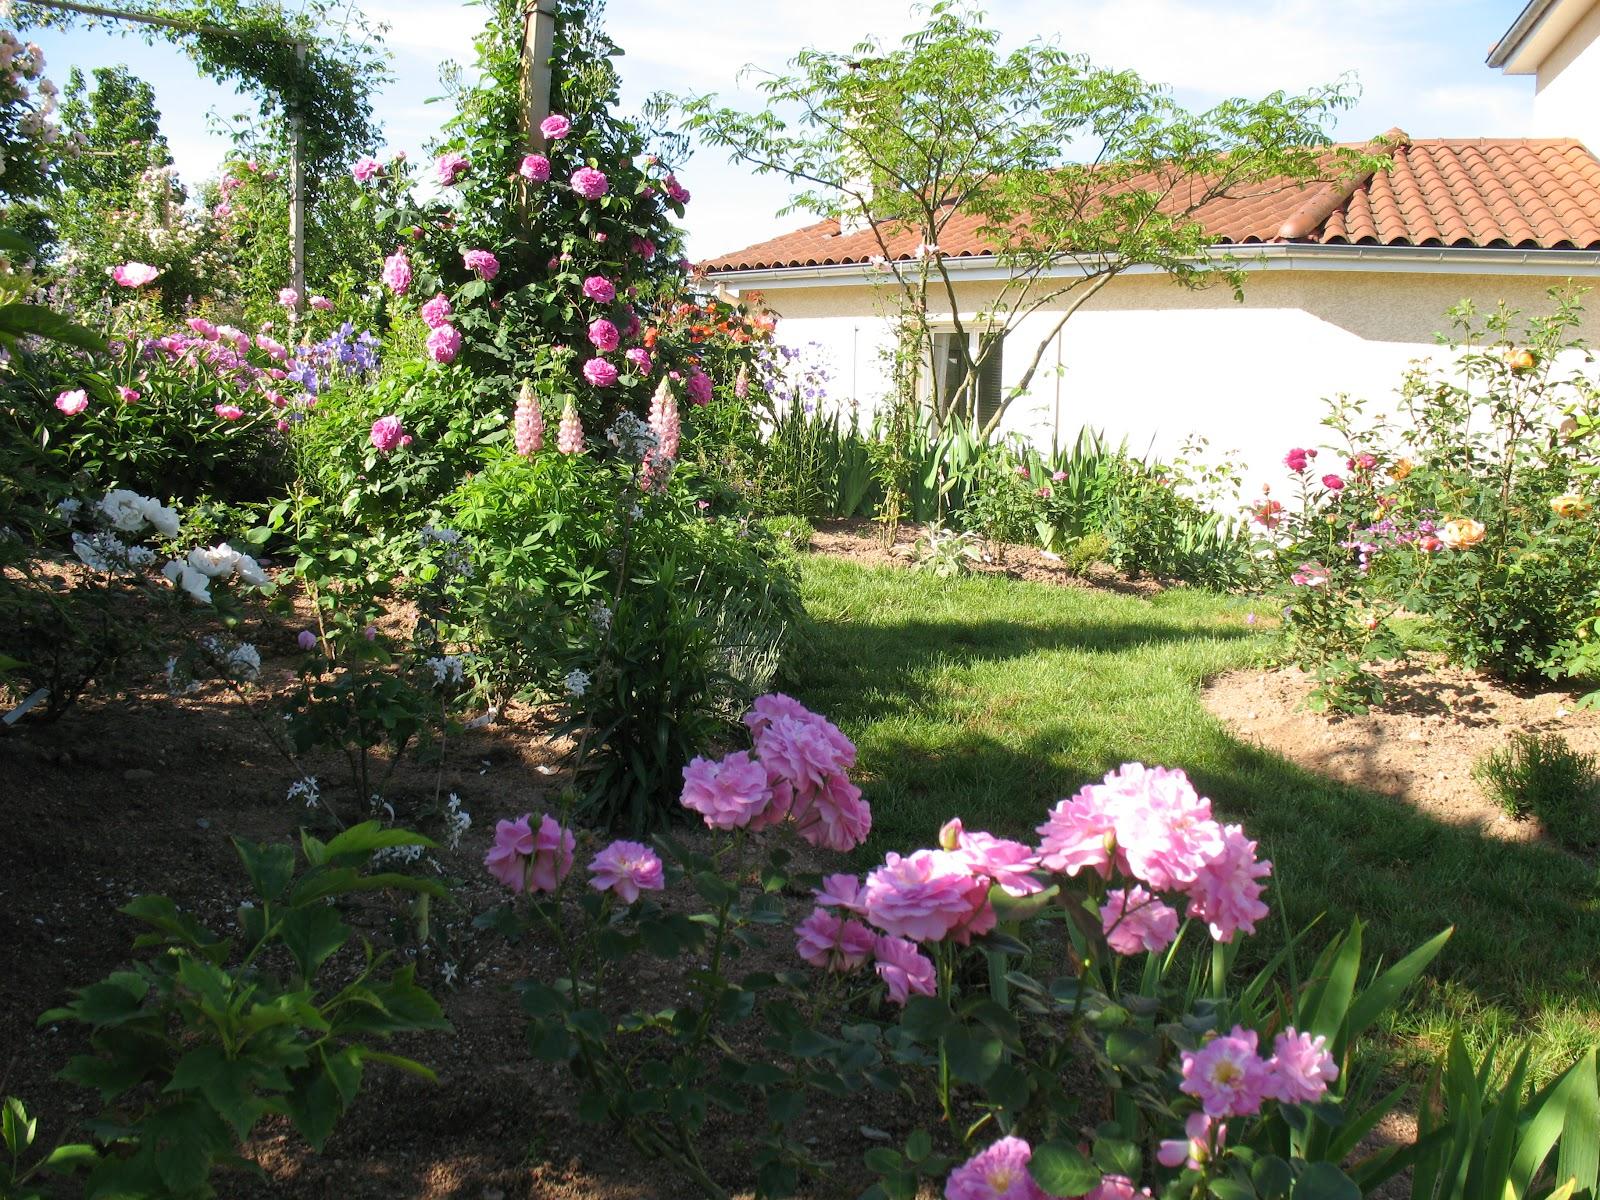 Roses du jardin ch neland rosier lavender lassie for Decoration jardin rosier